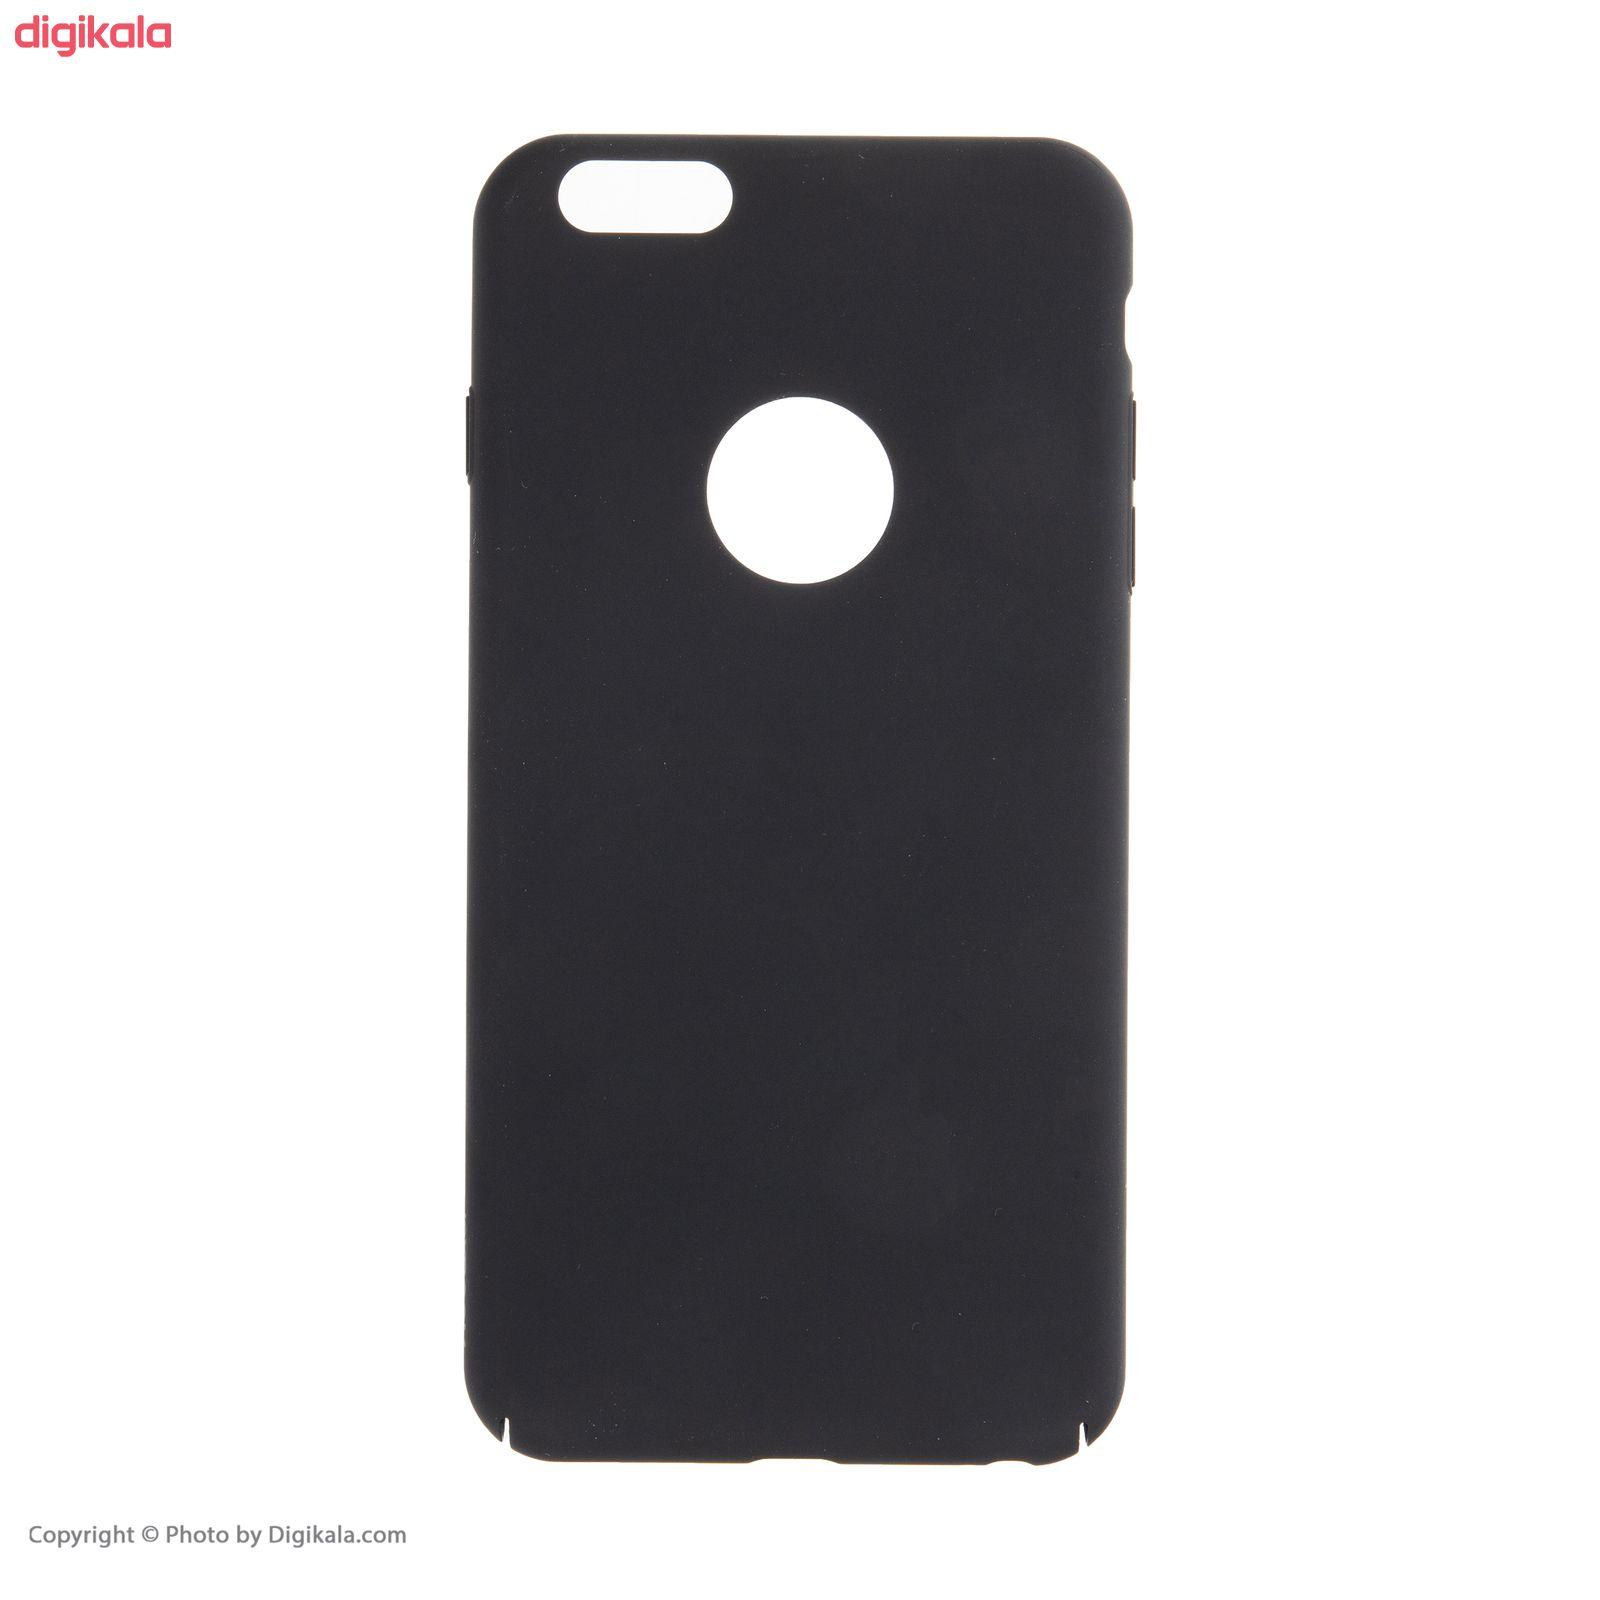 کاور جوی روم مدل JR-BP157 مناسب برای گوشی موبایل اپل iPhone 6 plus/6s plus  main 1 6